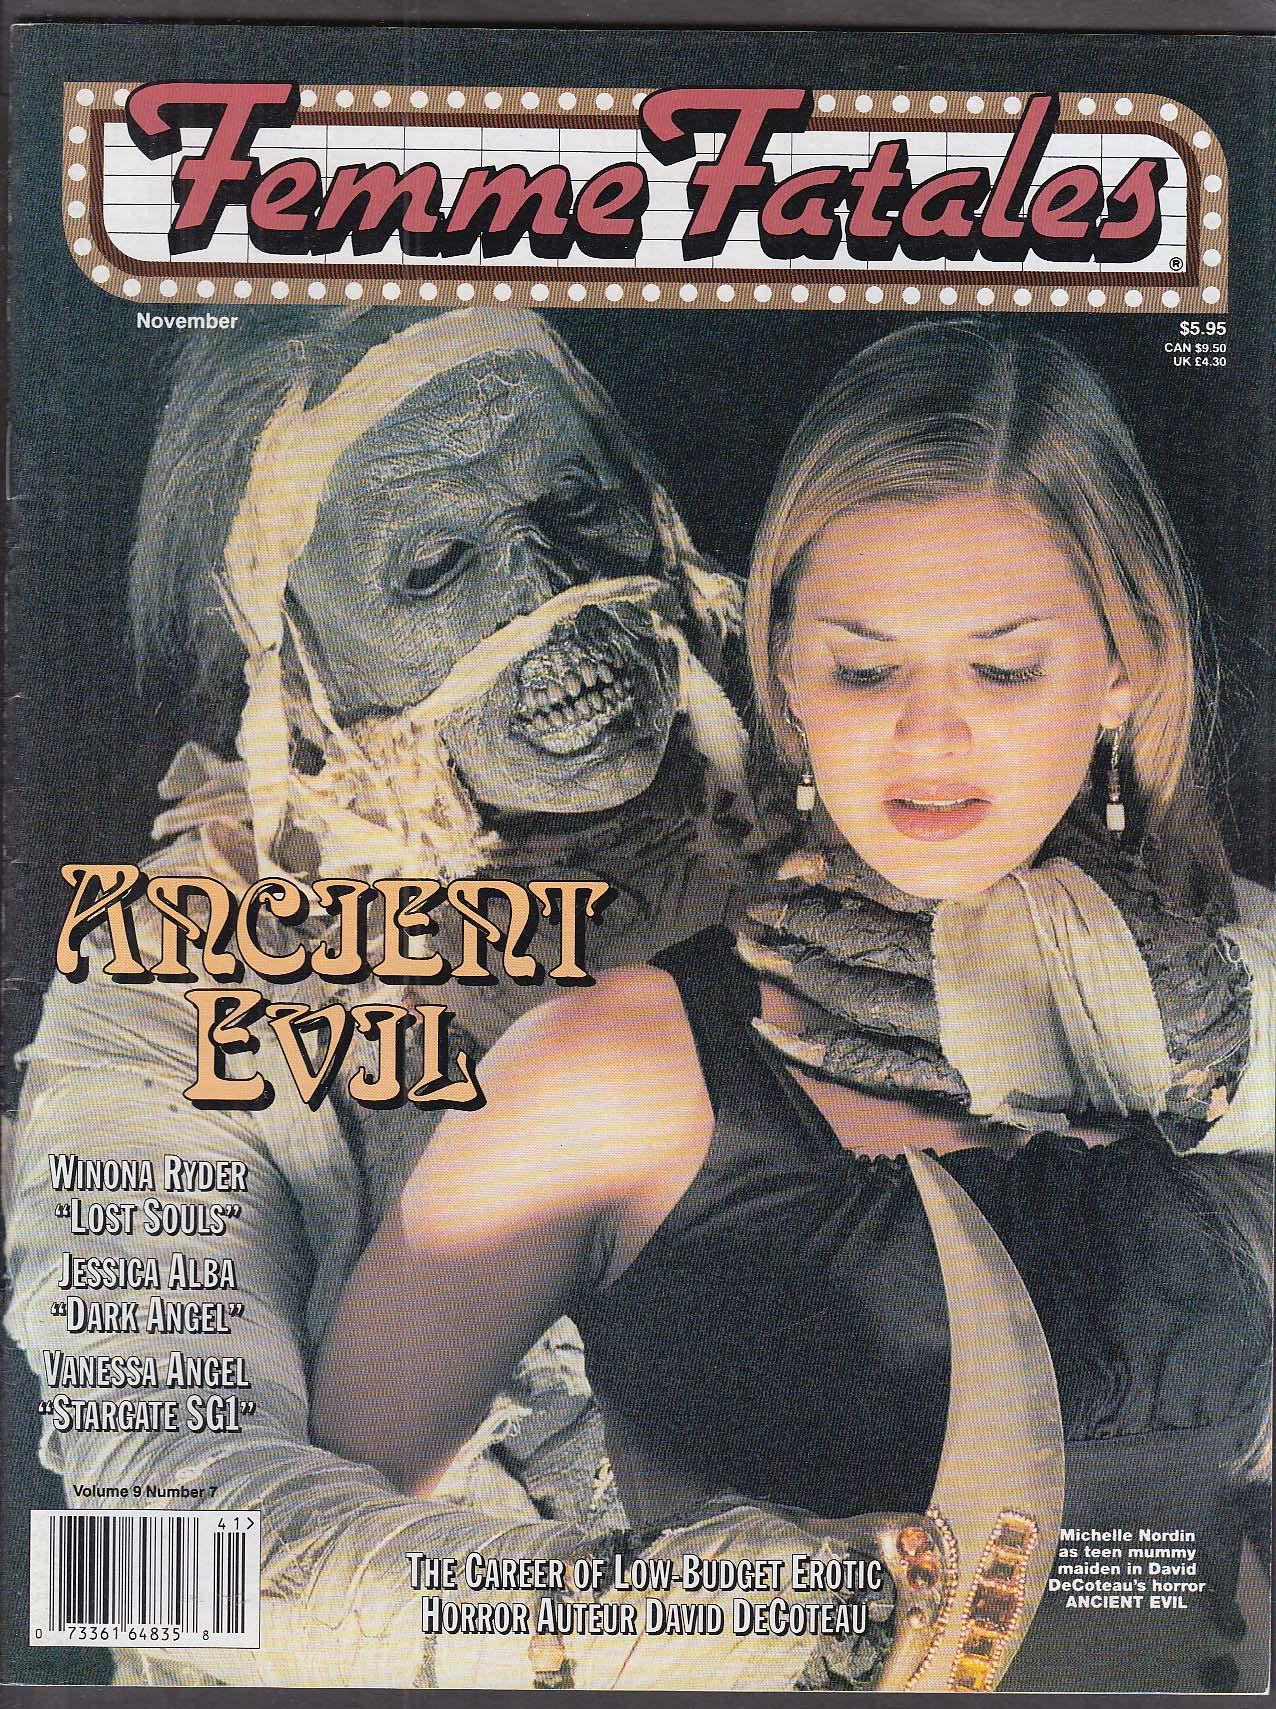 FEMME FATALES Michelle Nordin Winona Ryder Jessica Alba Vanessa Angel ++ 11 2000